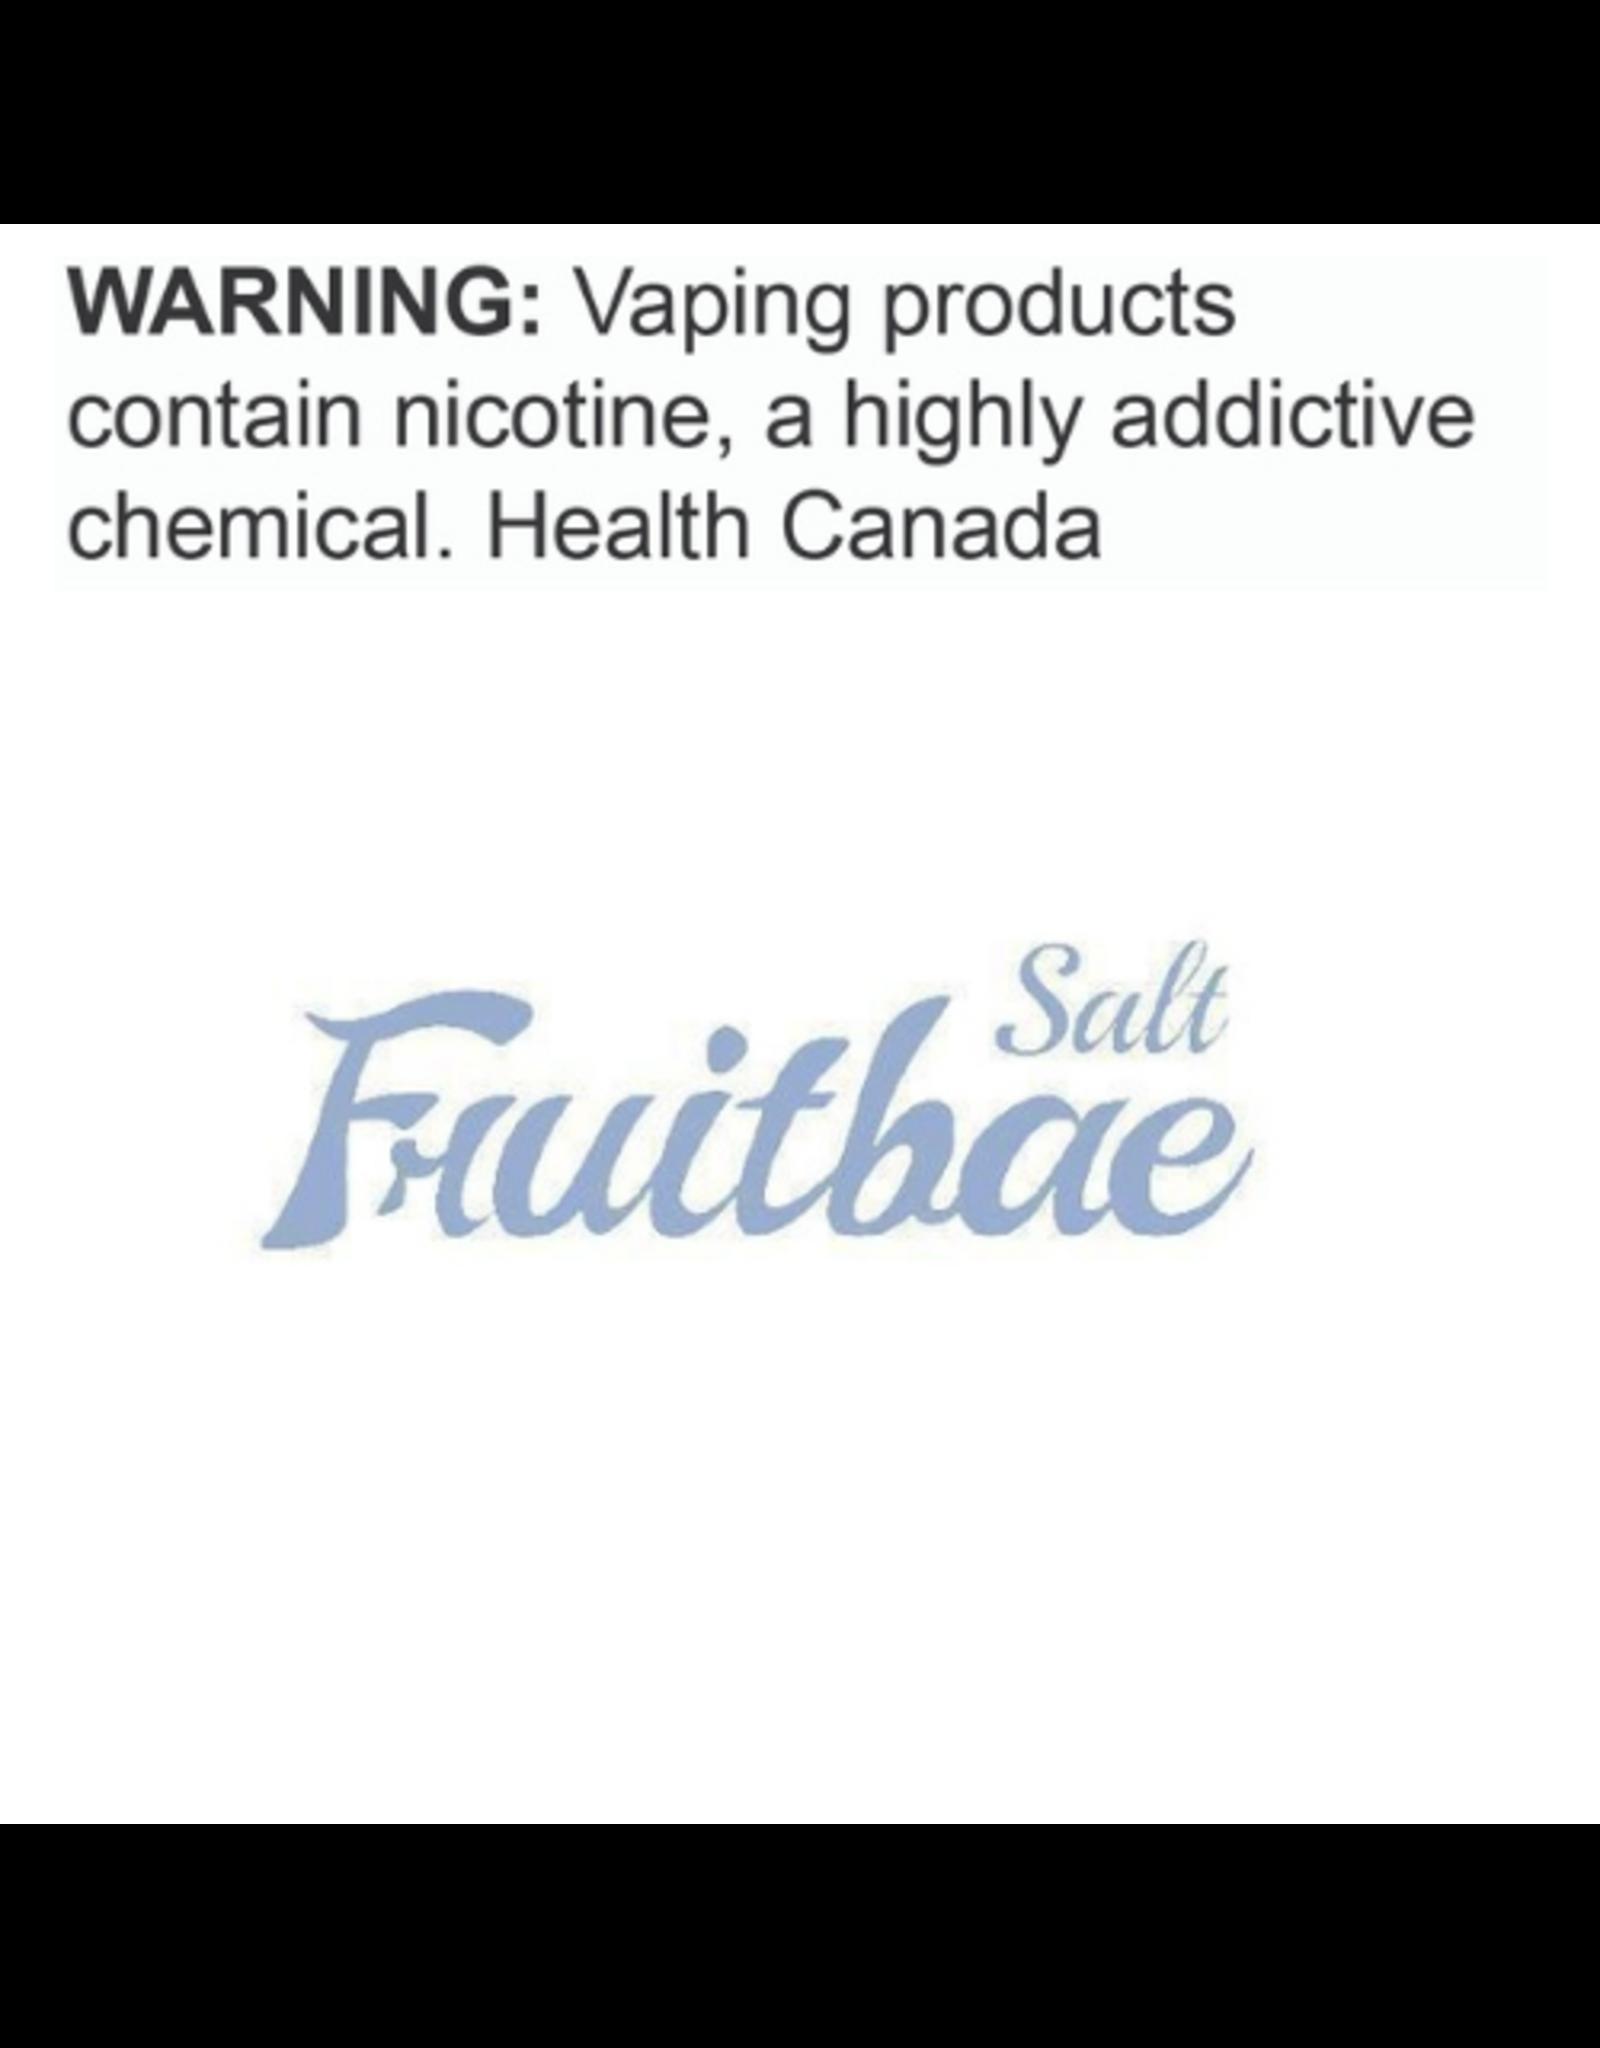 fruitbae Fruitbae Salt